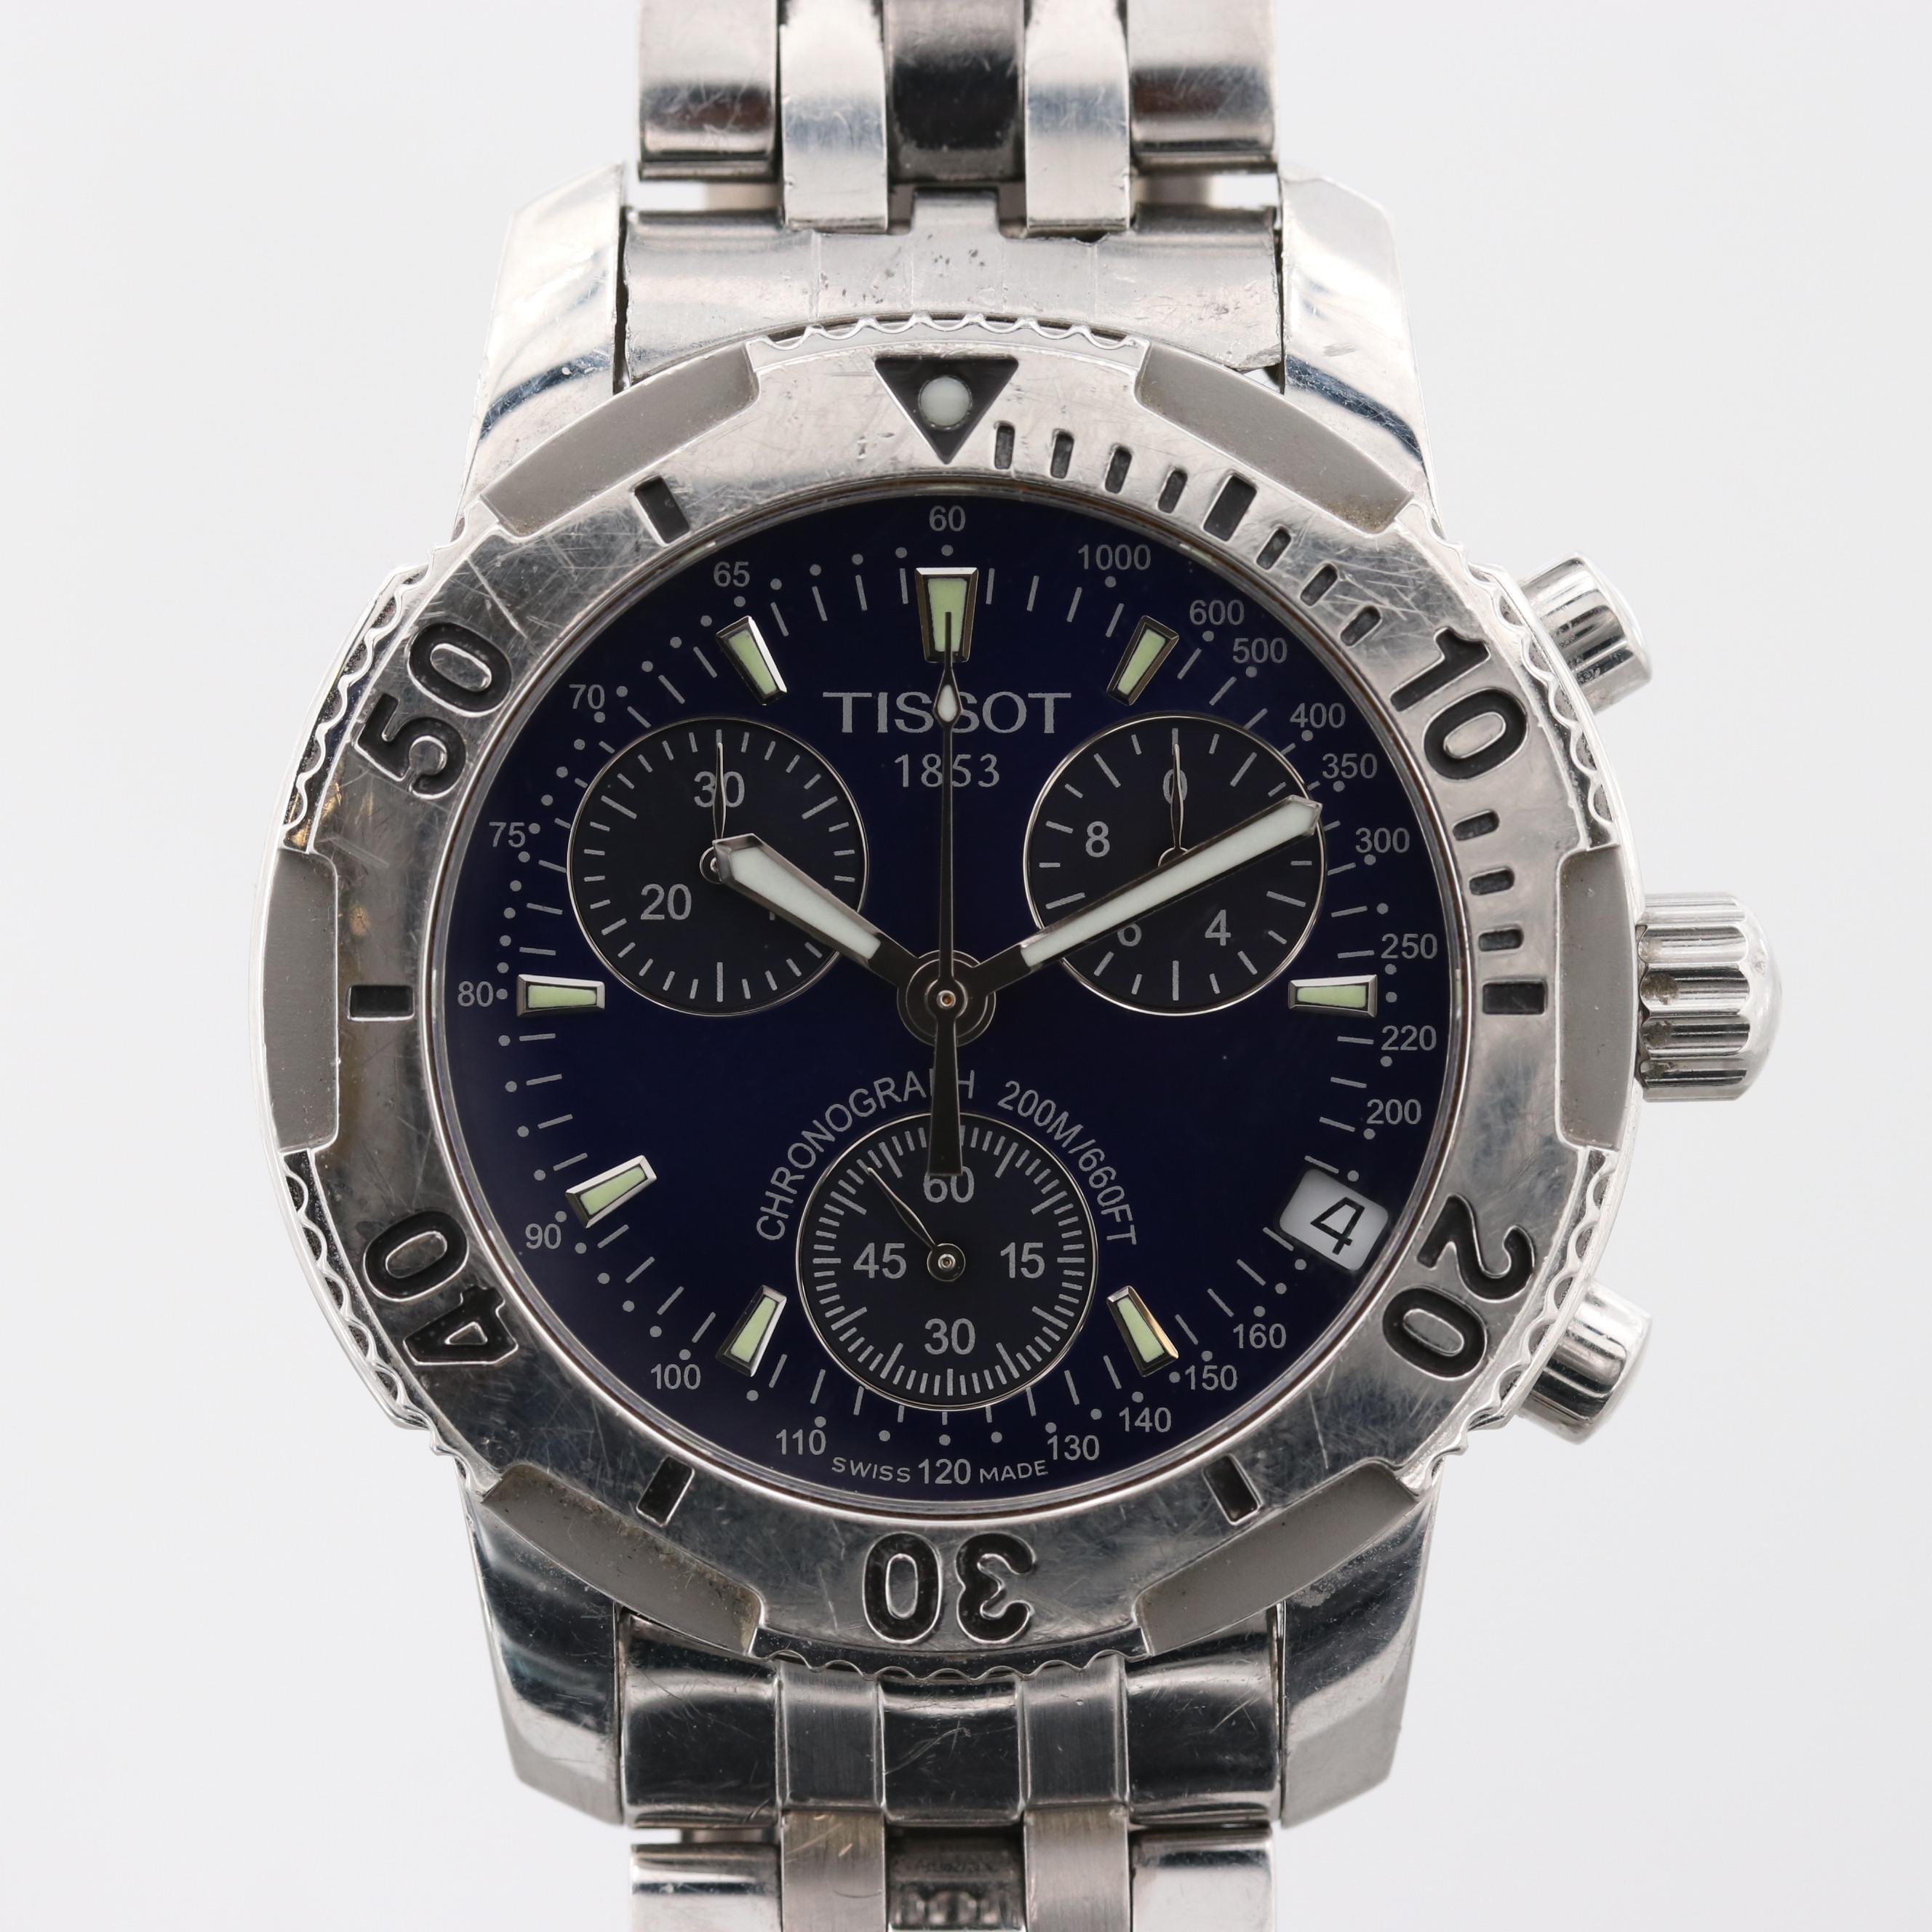 Tissot PR5200 Stainless Steel Quartz Chronograph Wristwatch